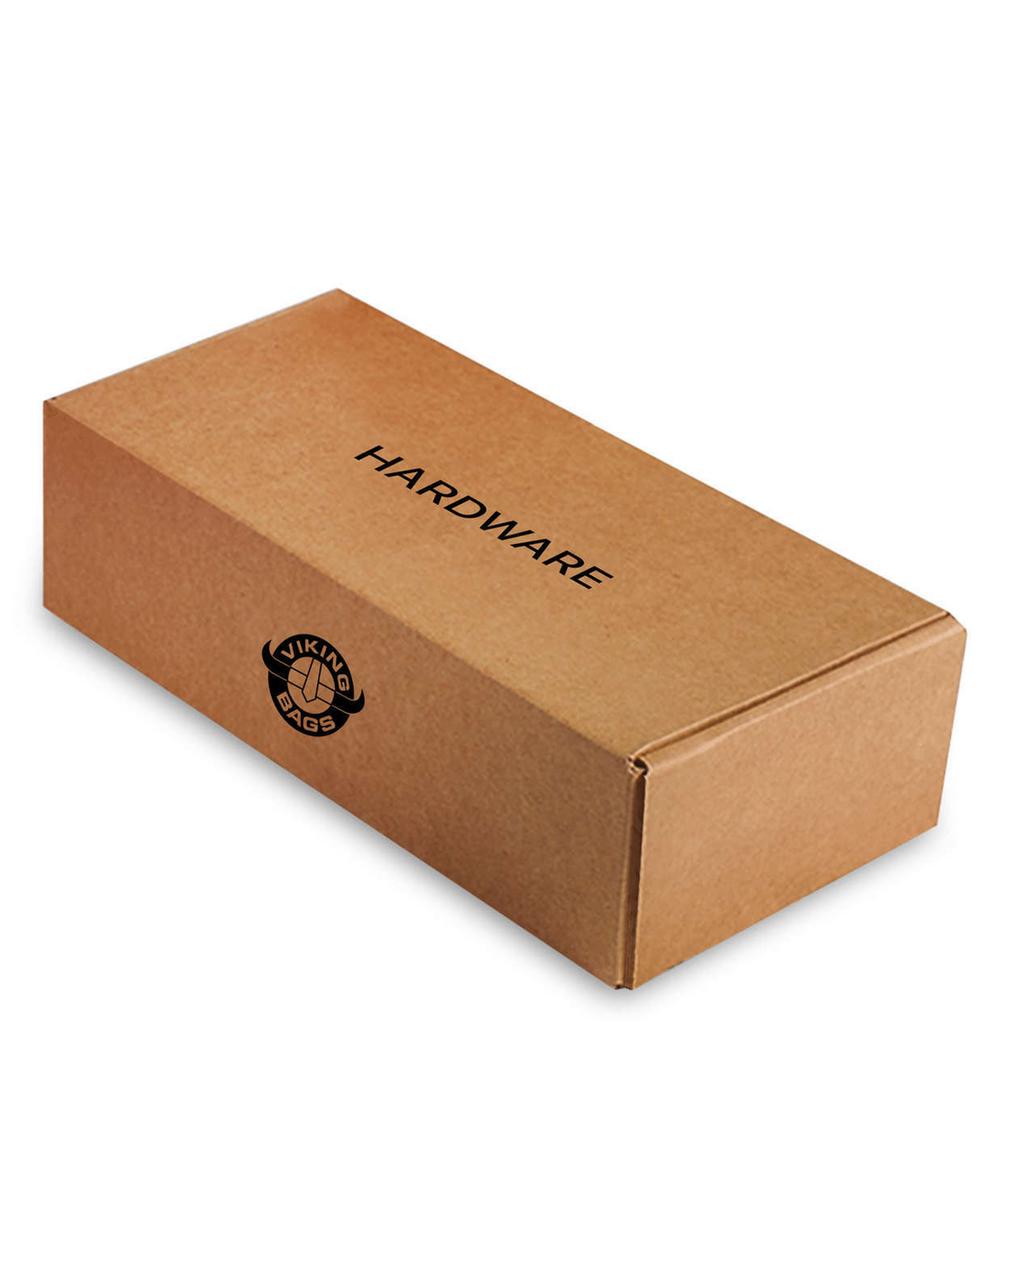 Honda 1500 Valkyrie Interstate Slanted Medium Motorcycle Saddlebags Hardware Box